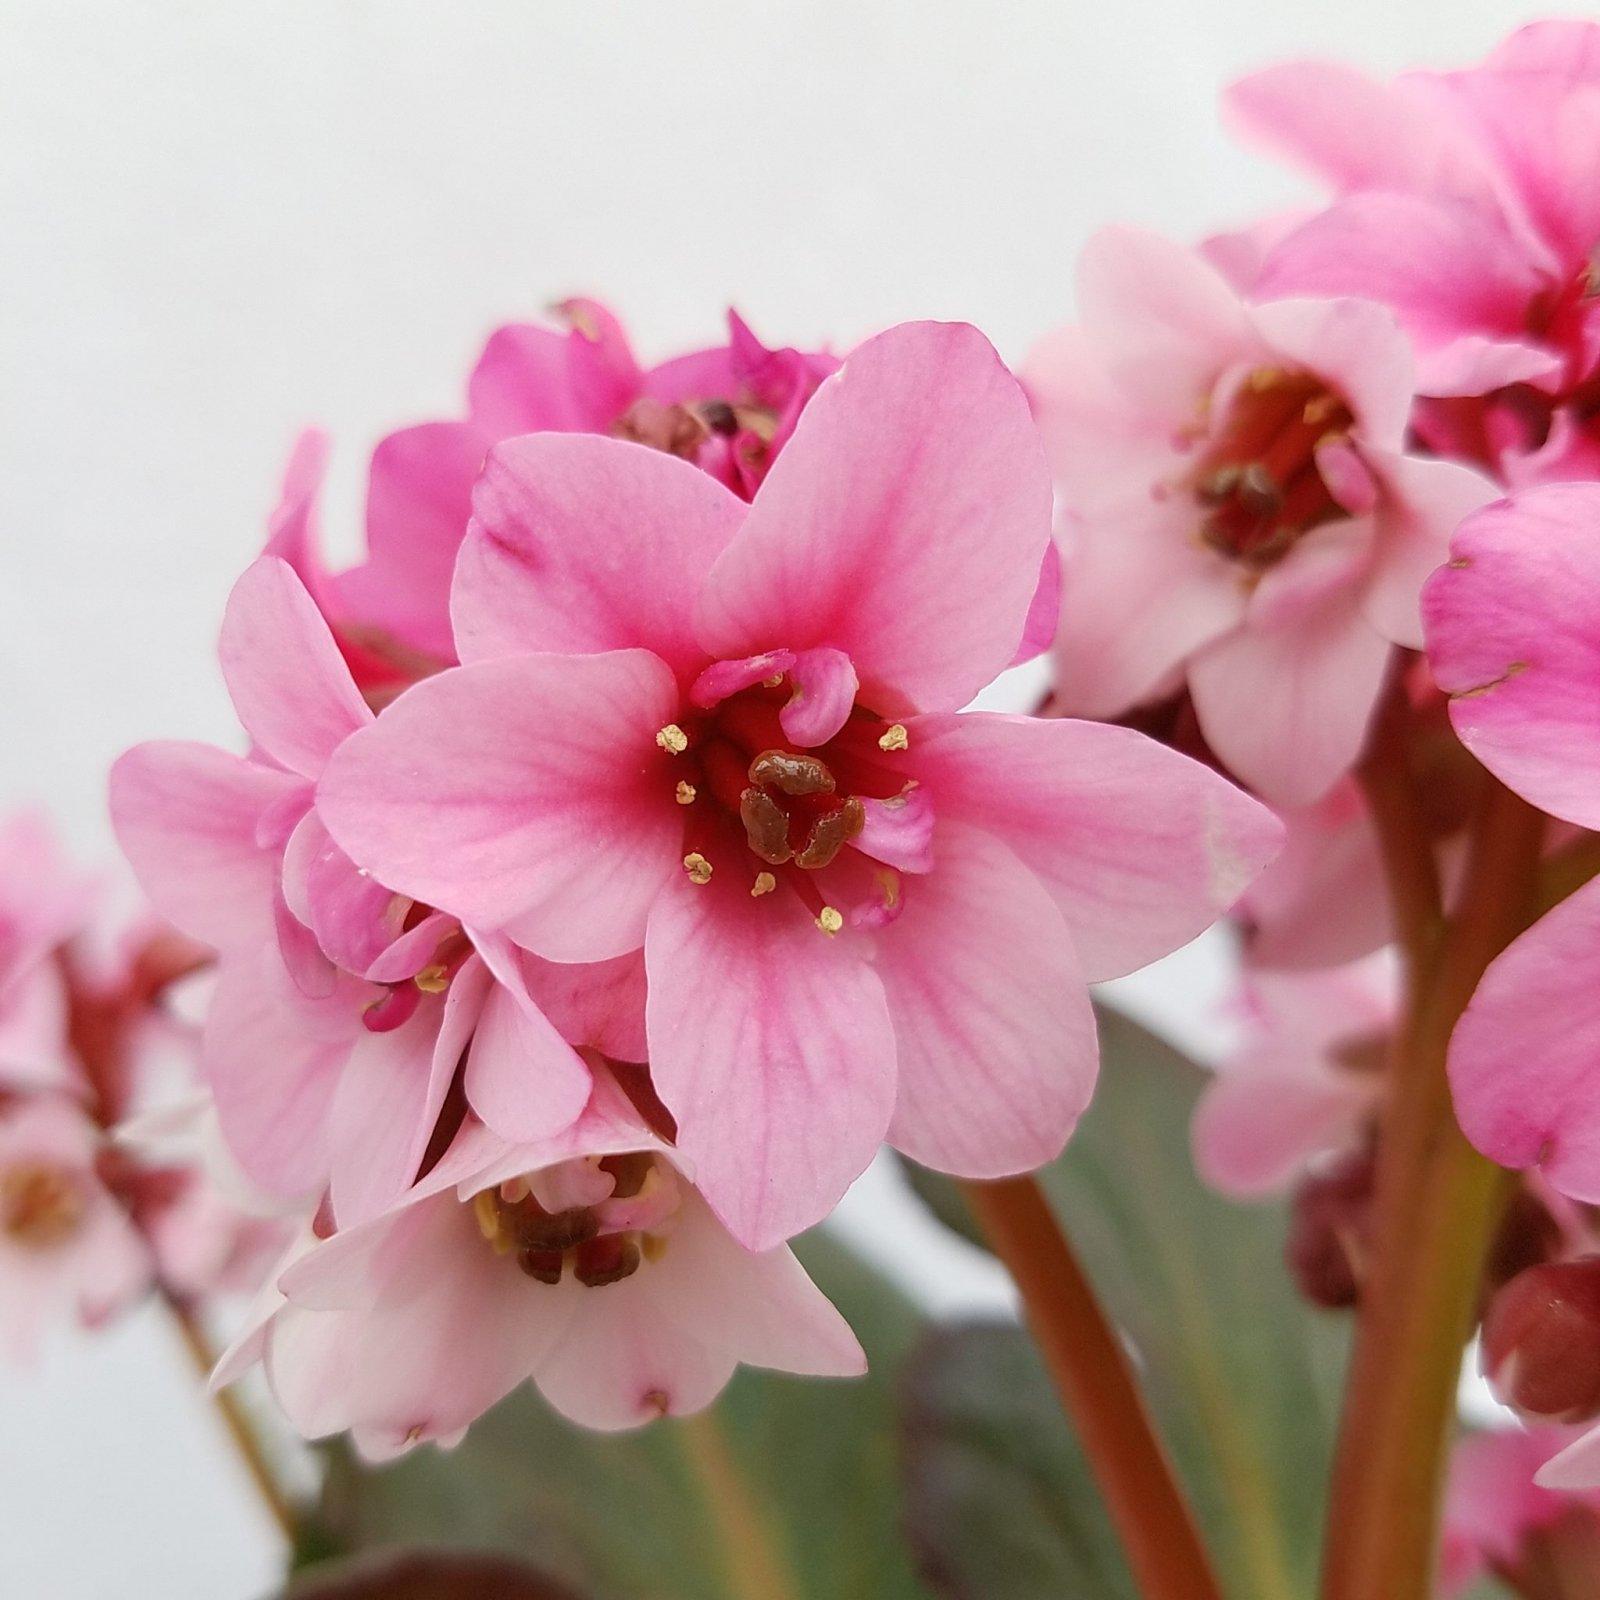 Bergenia cordifolia 'Sakura' - #1